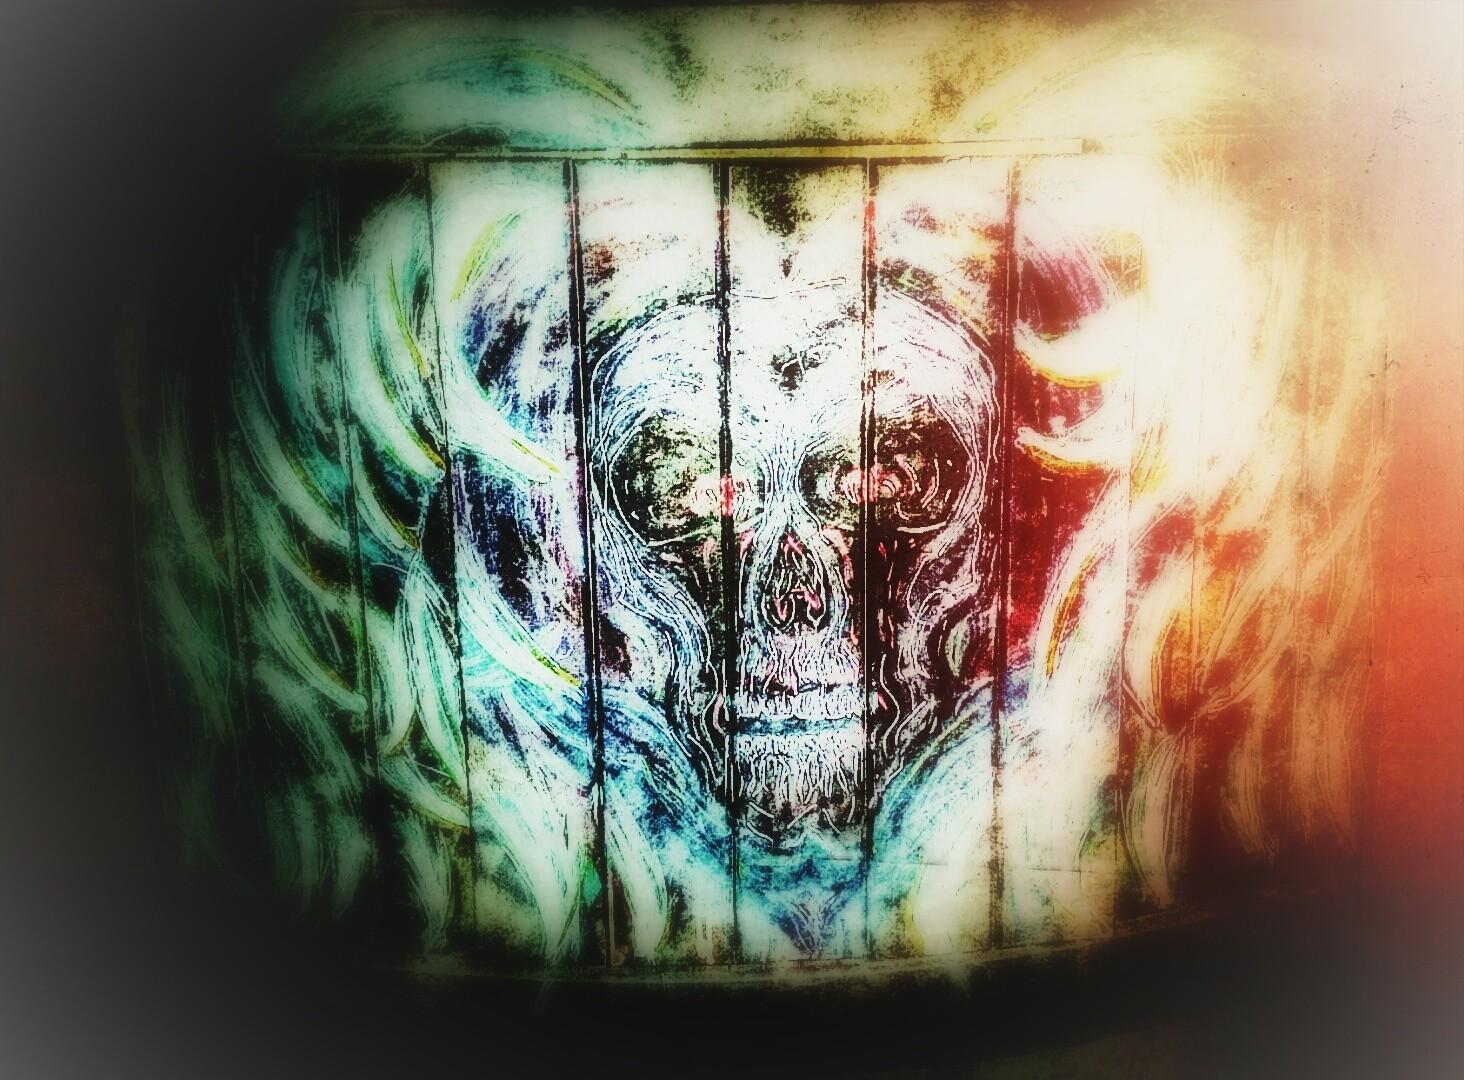 #TheBeardedWelder #painting #art #slipknot #korn #eminem #rihanna #chive #acrylic #angel #good #evil #original #creepy #artwork #heart #MetalArt #nin #halloween #love #broken #god #devil #tattoo #monster #skull #selfmade #resurrection #streetart #tbt #brush #beautiful